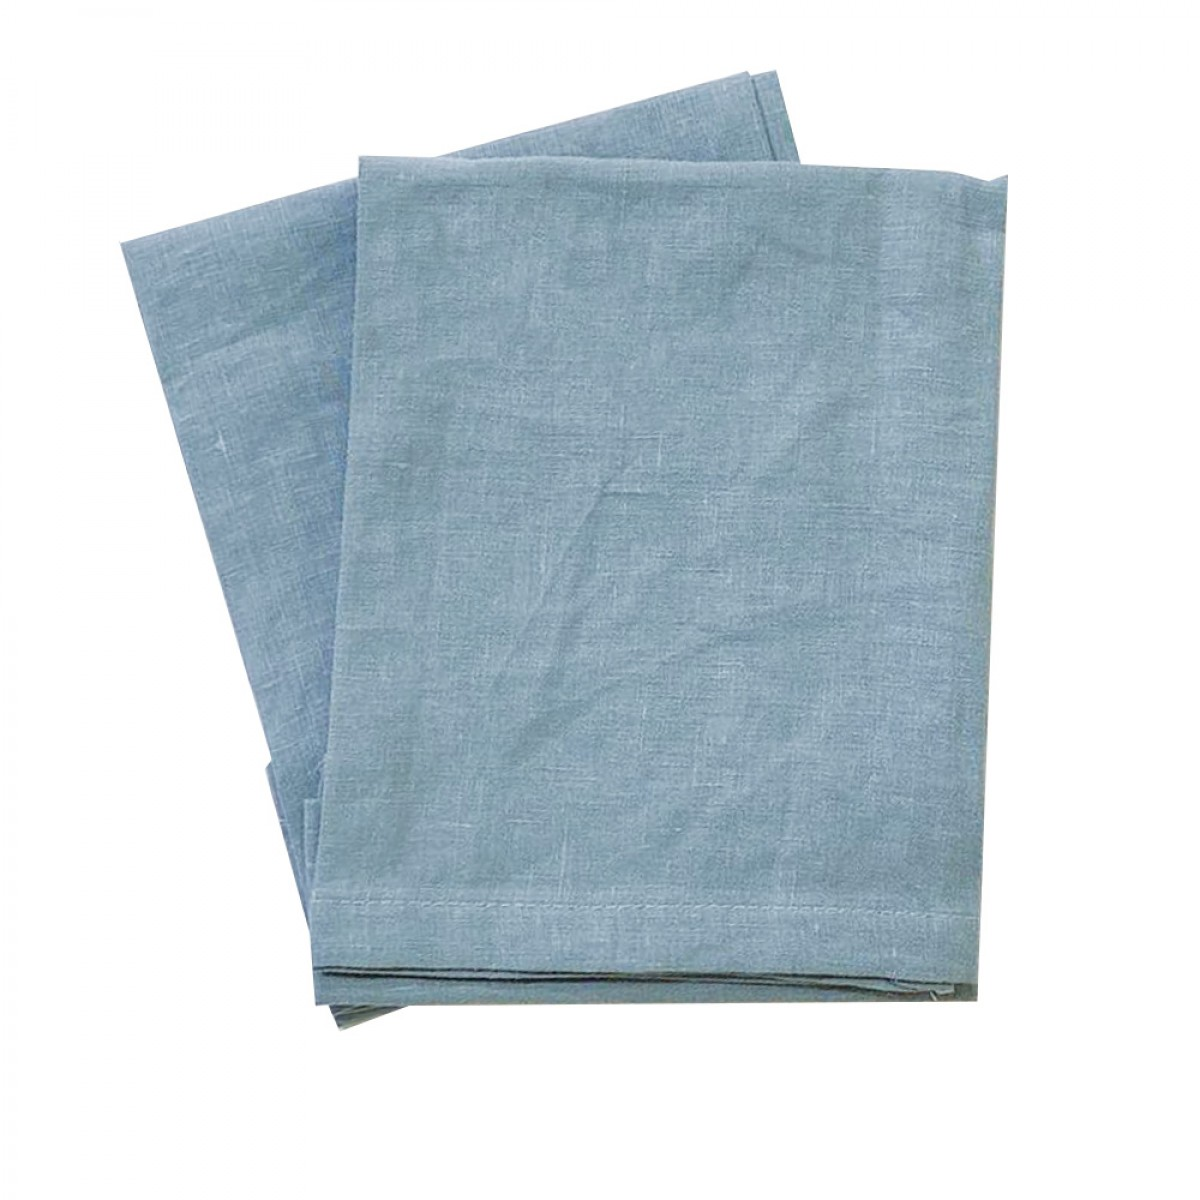 Linen Napkin - French Blue (Set of 6)